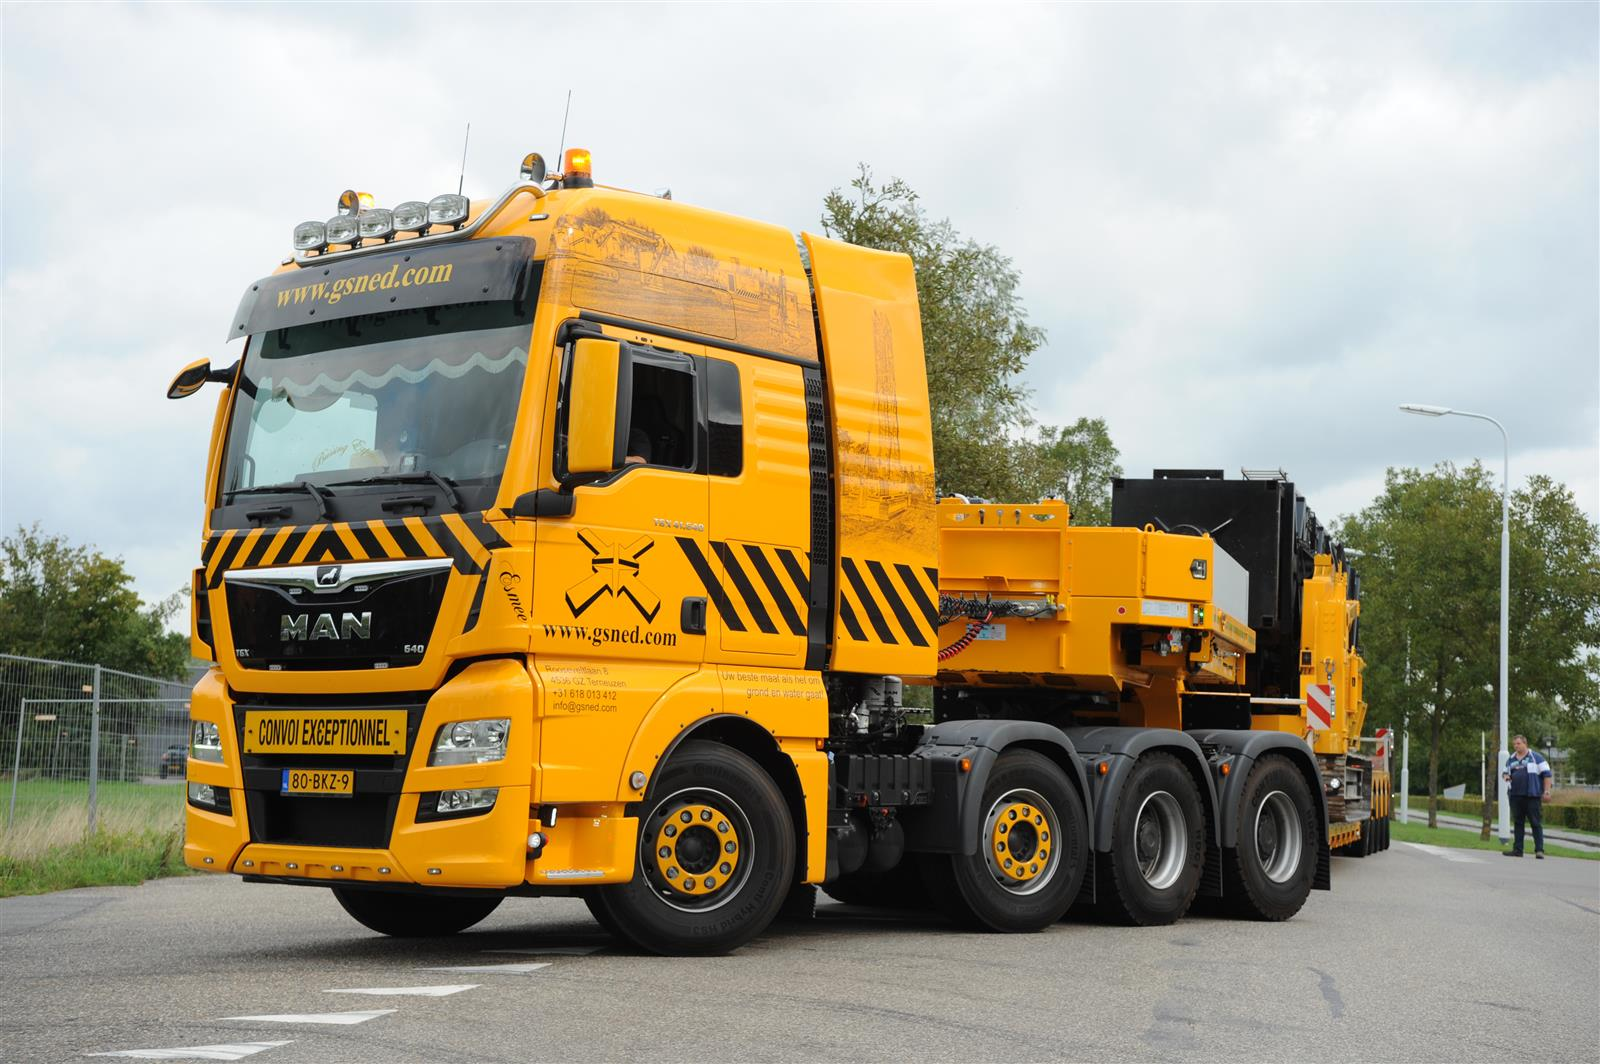 MAN TGX 8X4-4 41.640 Heavy Transport Truck - GSNED